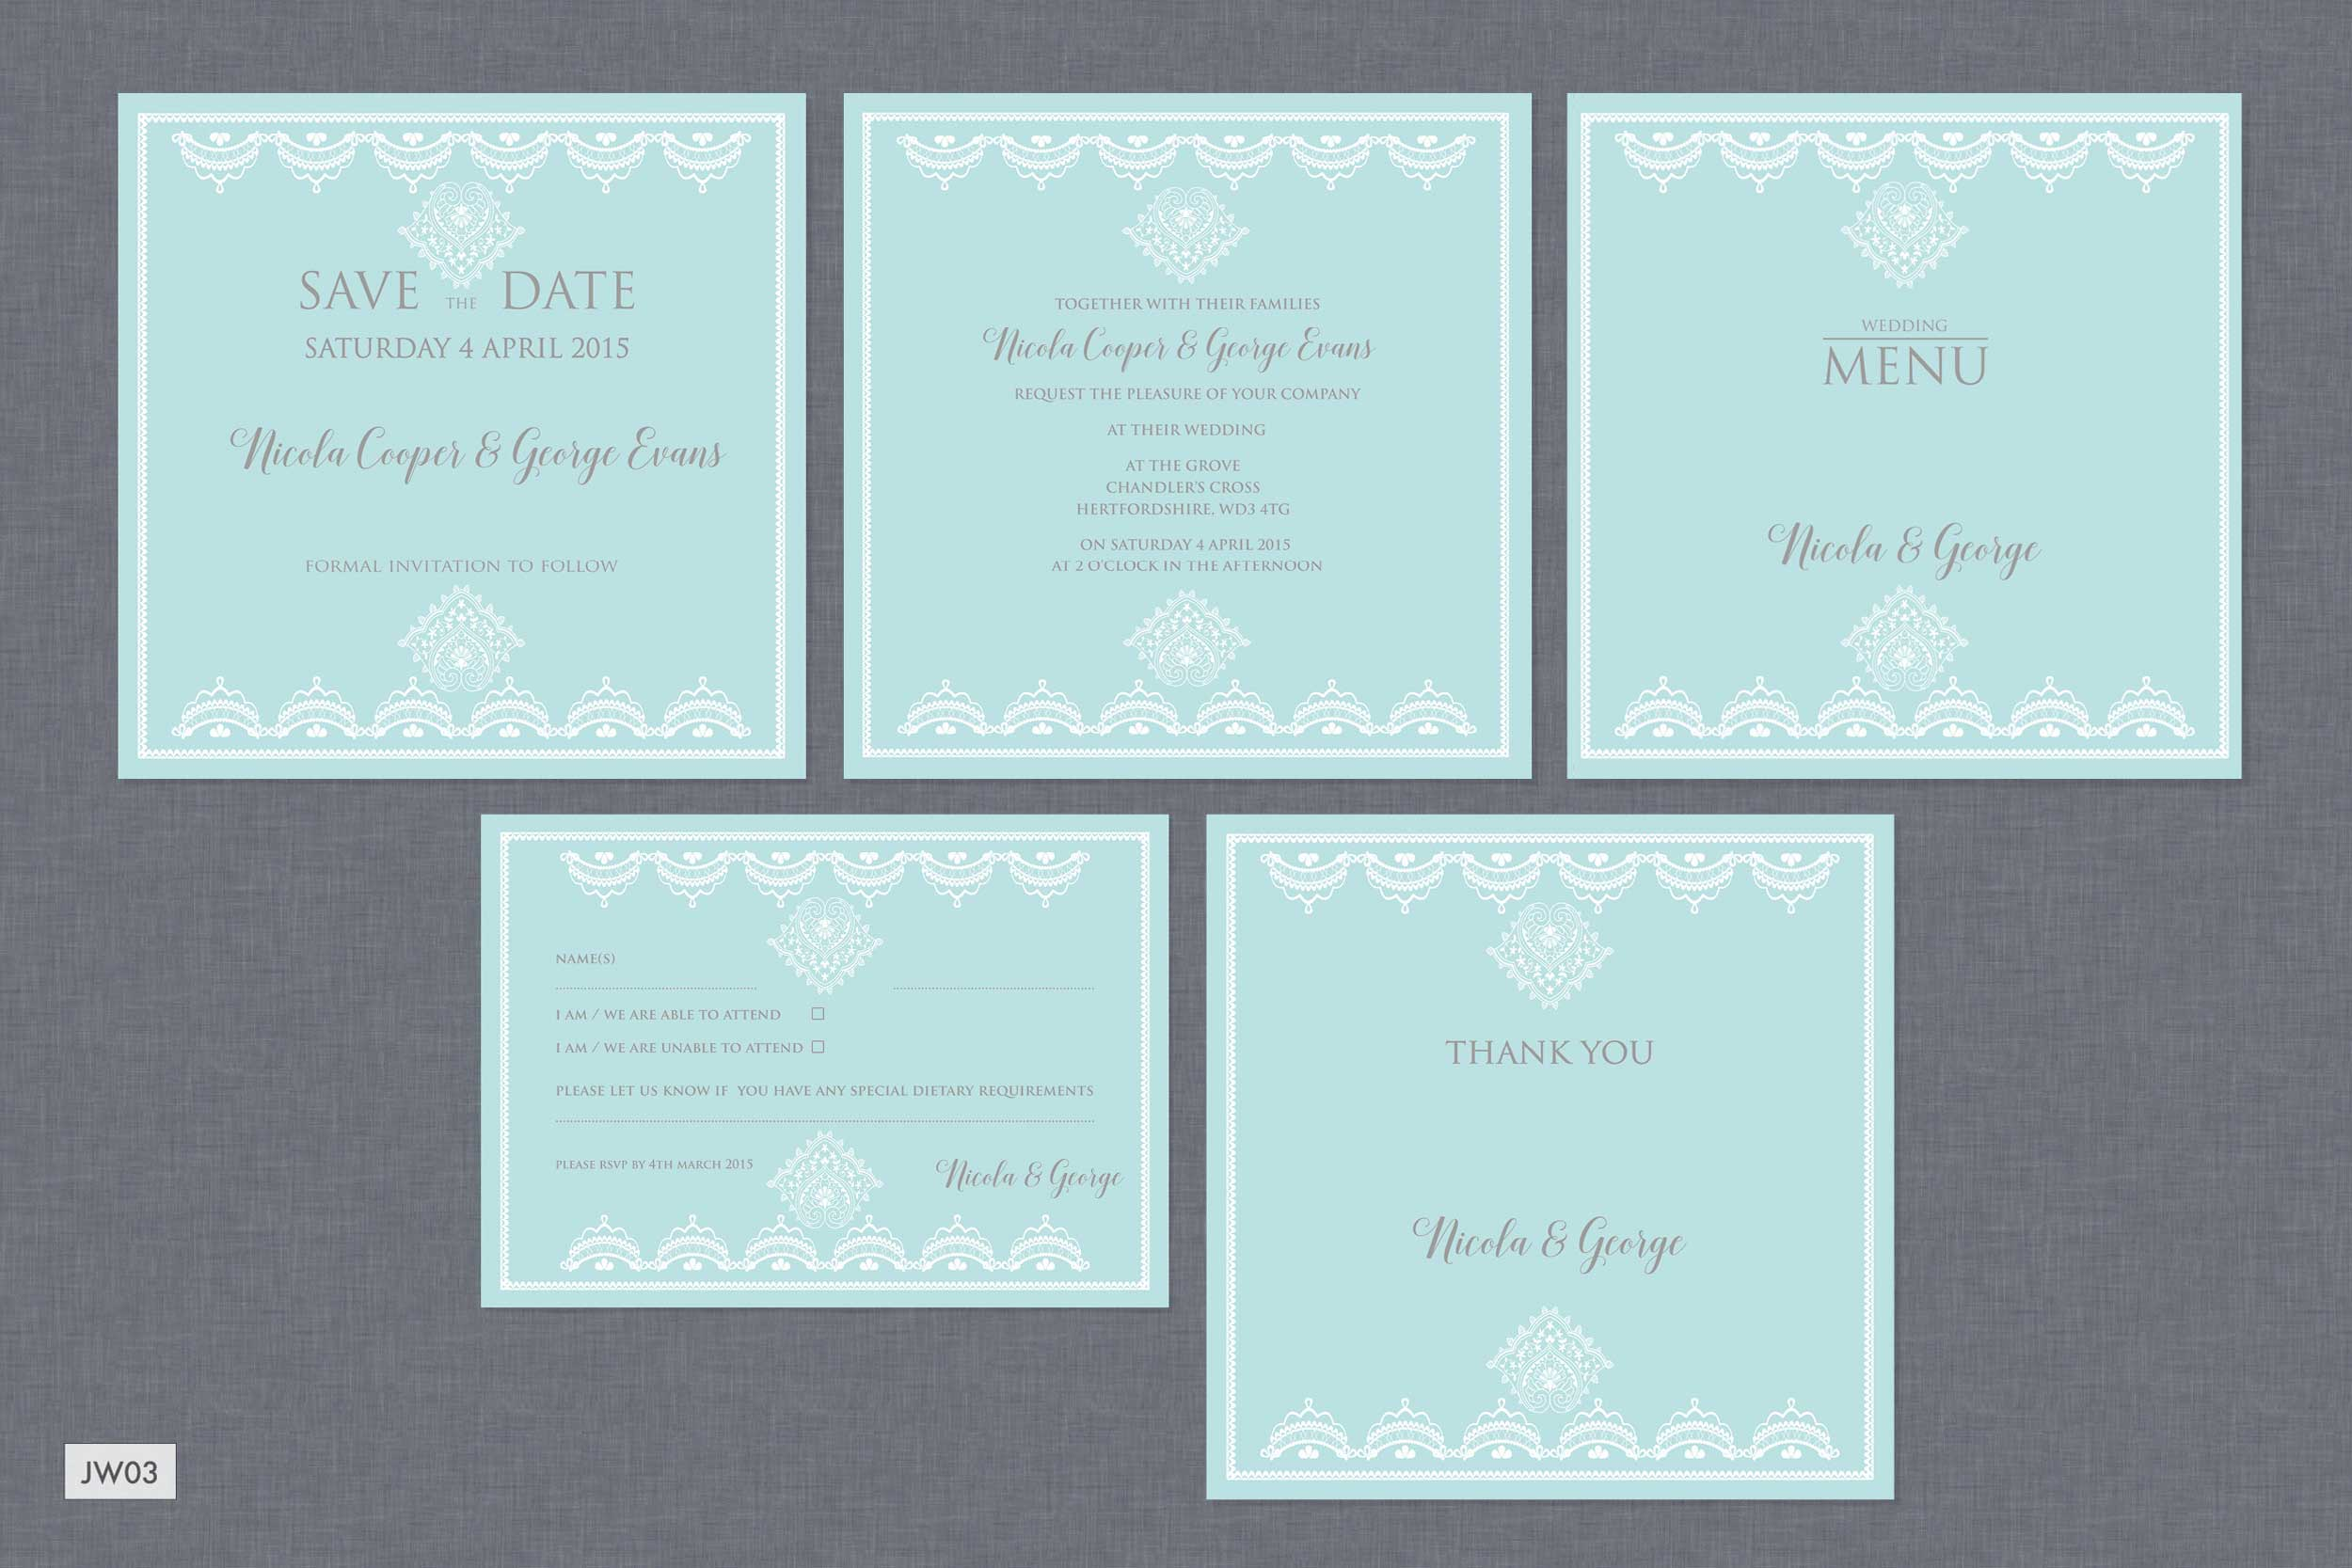 Teal-lace_stationery_jersey_weddings_ananyacards.com_03.jpg